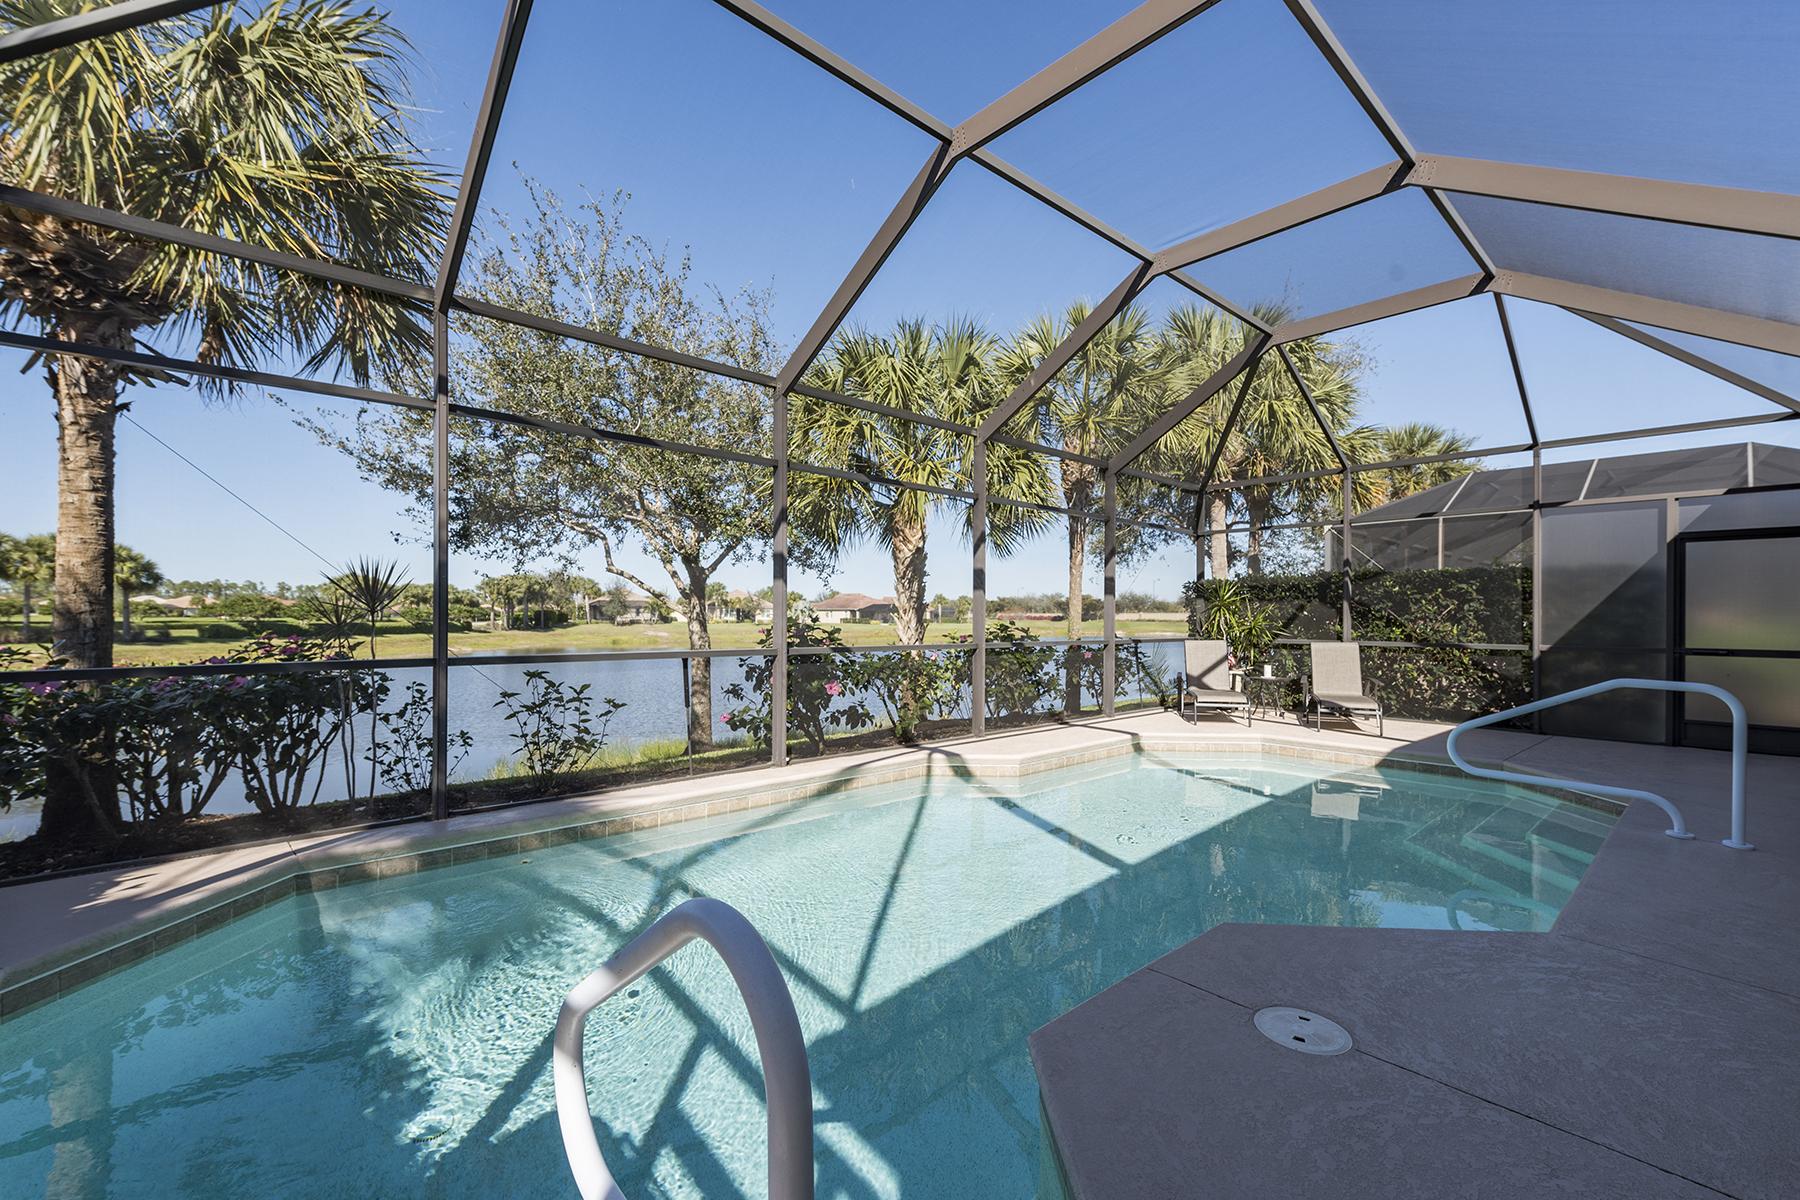 Additional photo for property listing at HAWTHORNE - COBBLESTONE 10373  Flat Stone Loop,  Bonita Springs, Florida 34135 United States